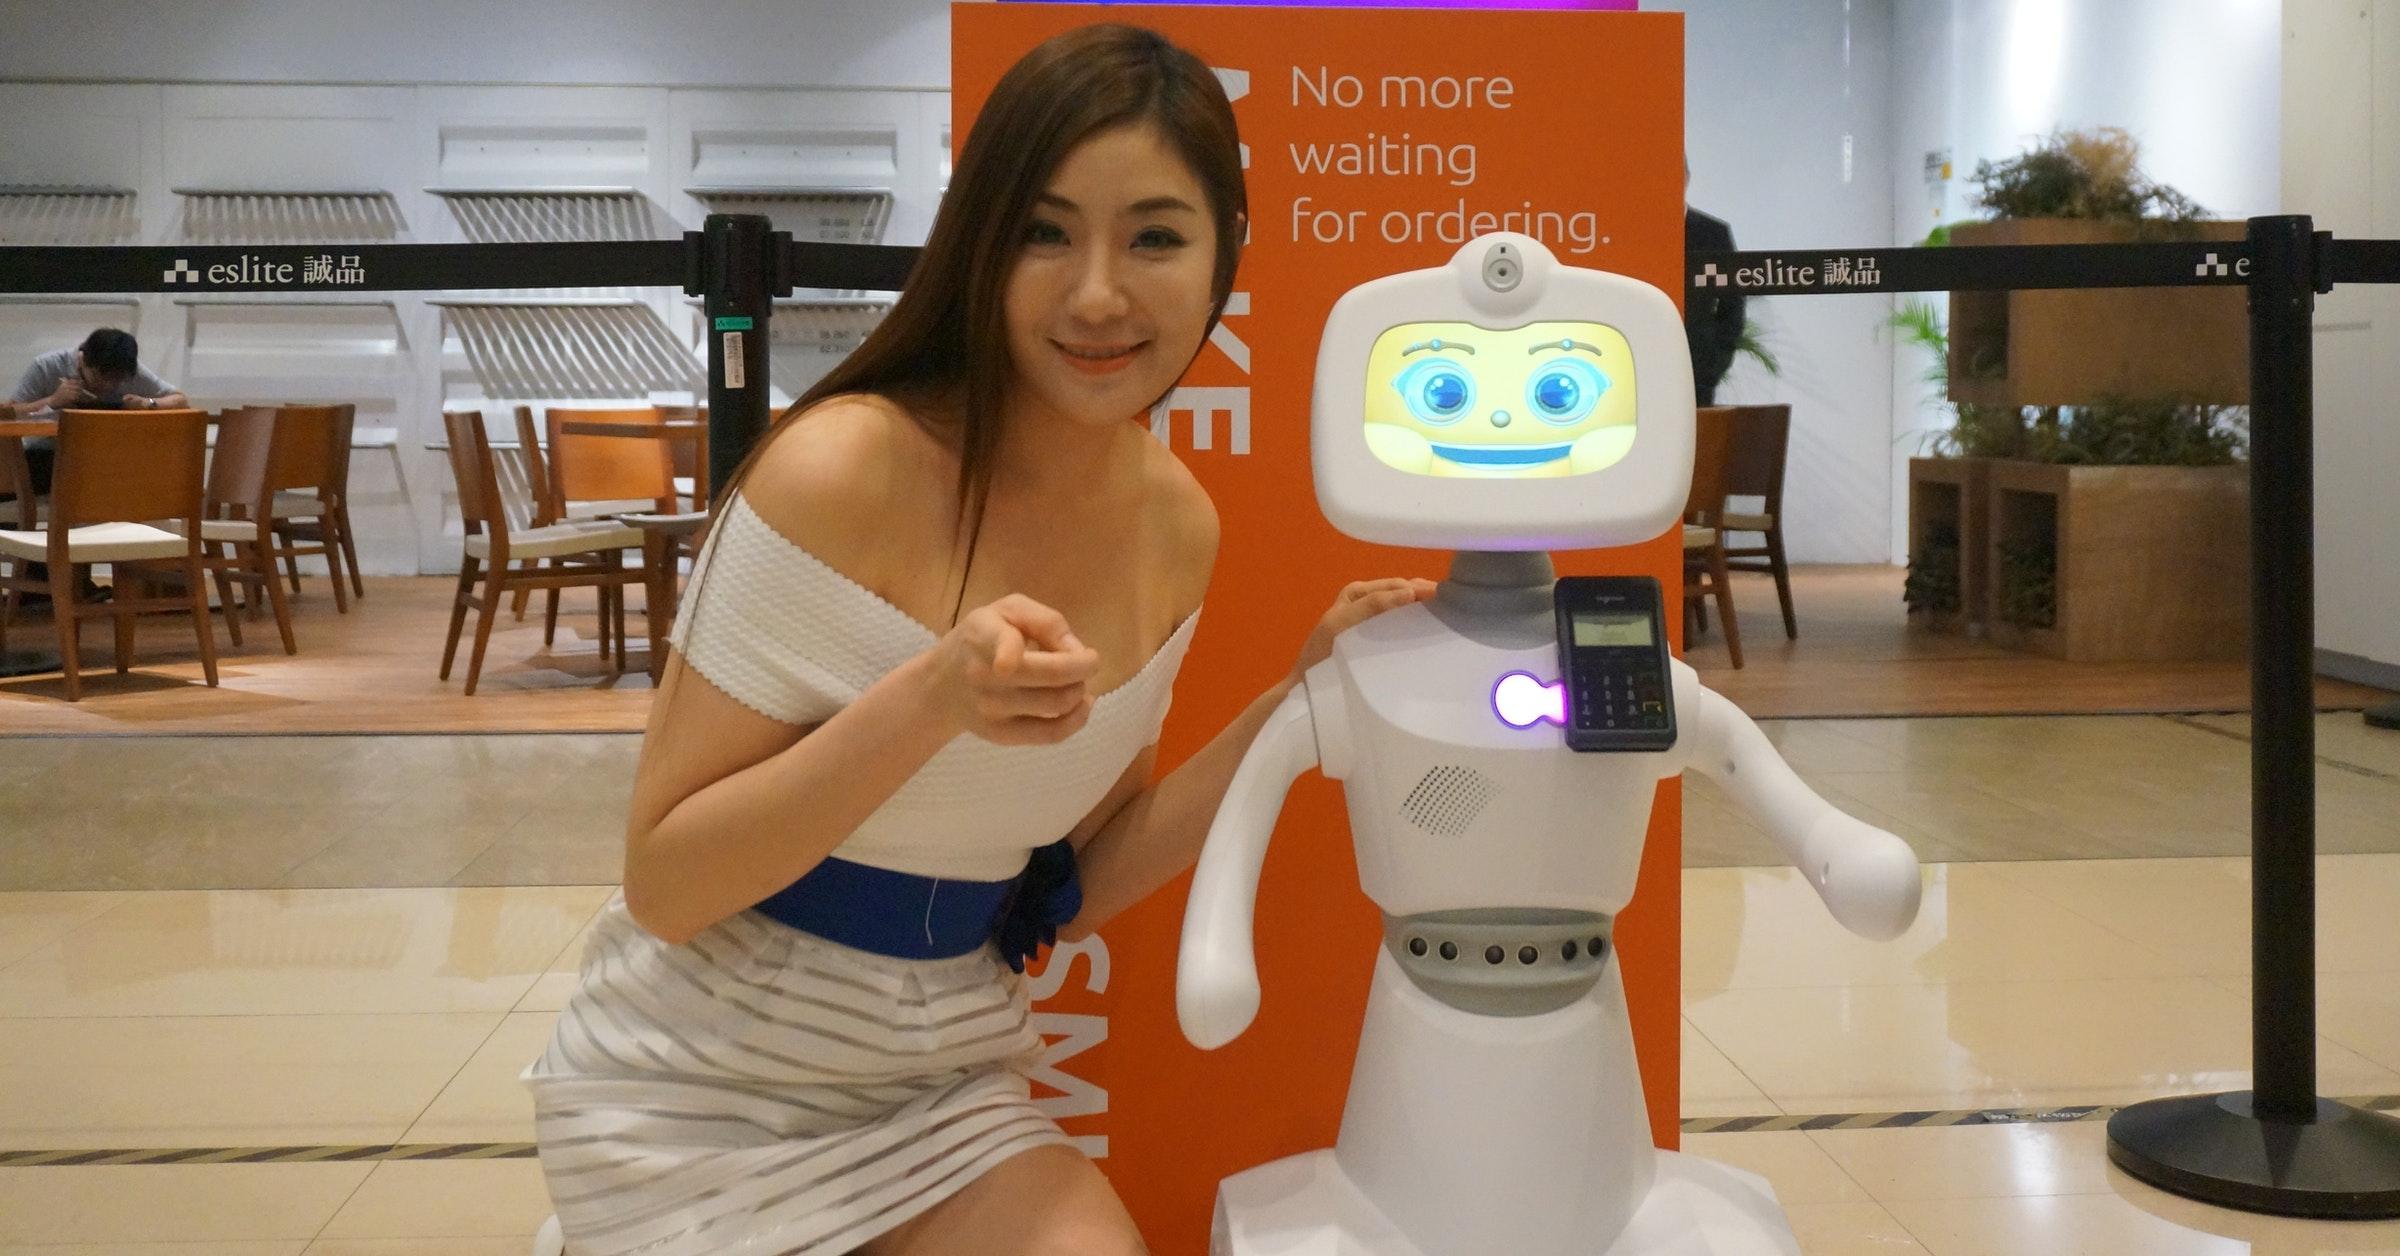 Technology, Product, Girl, girl, technology, girl, product